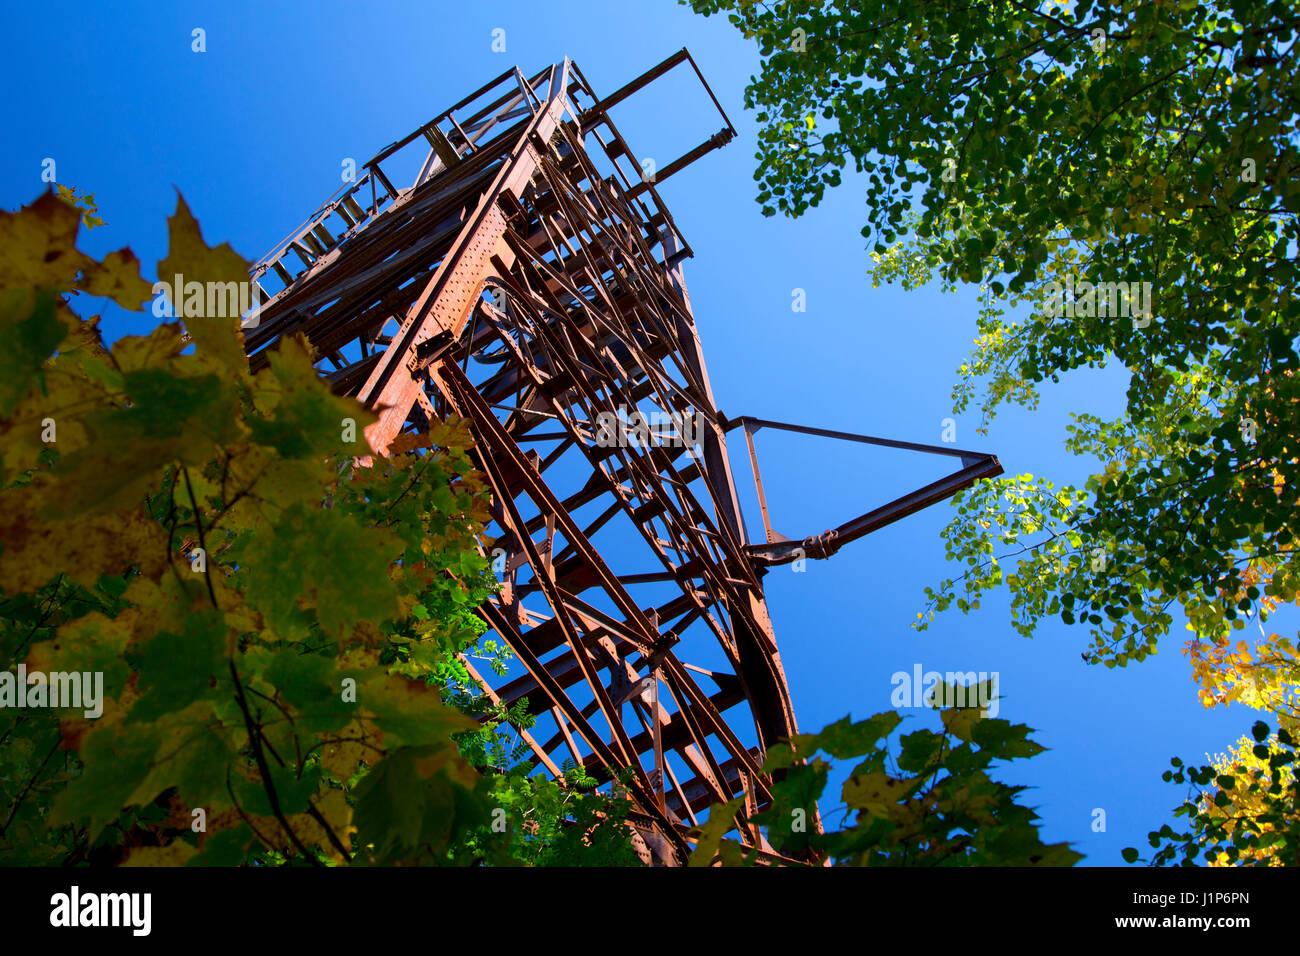 Headframe, Plummer Mine Mainframe Interpretive Park, Penokee Iron Range Trail, Iron County, Wisconsin - Stock Image